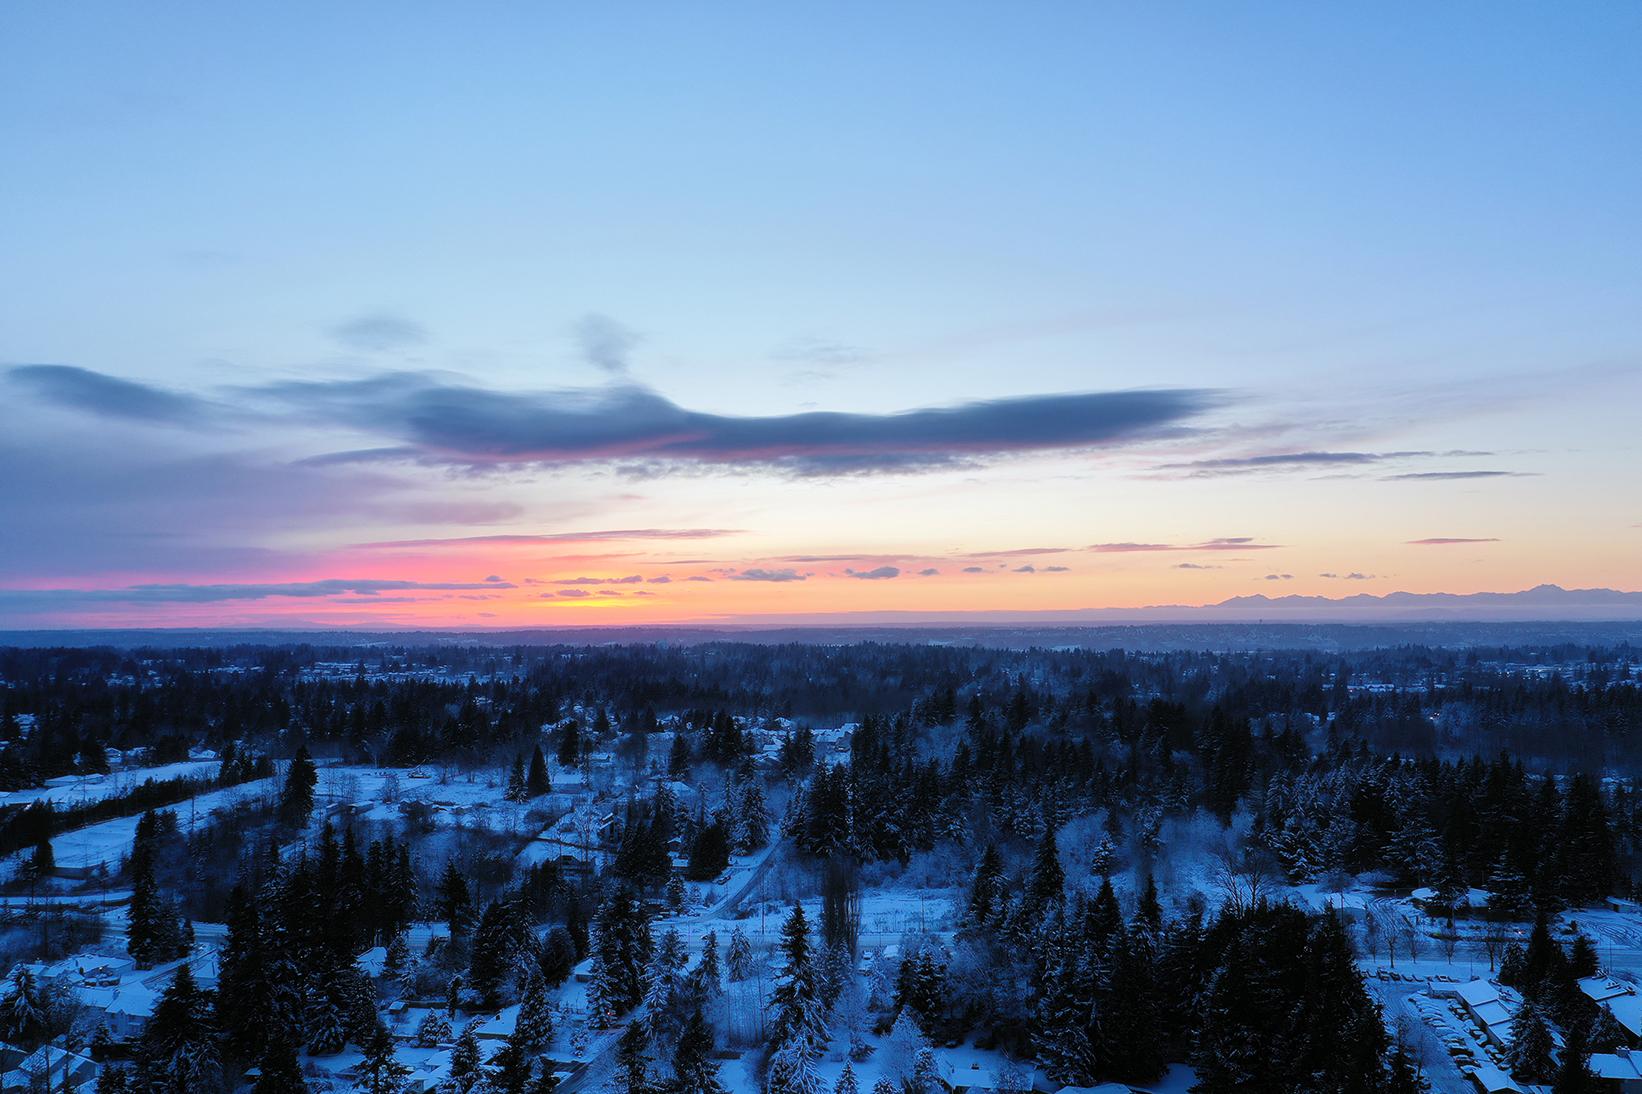 02_04_2019_Backyard_Snow_Sunset_04_SMALL.jpg